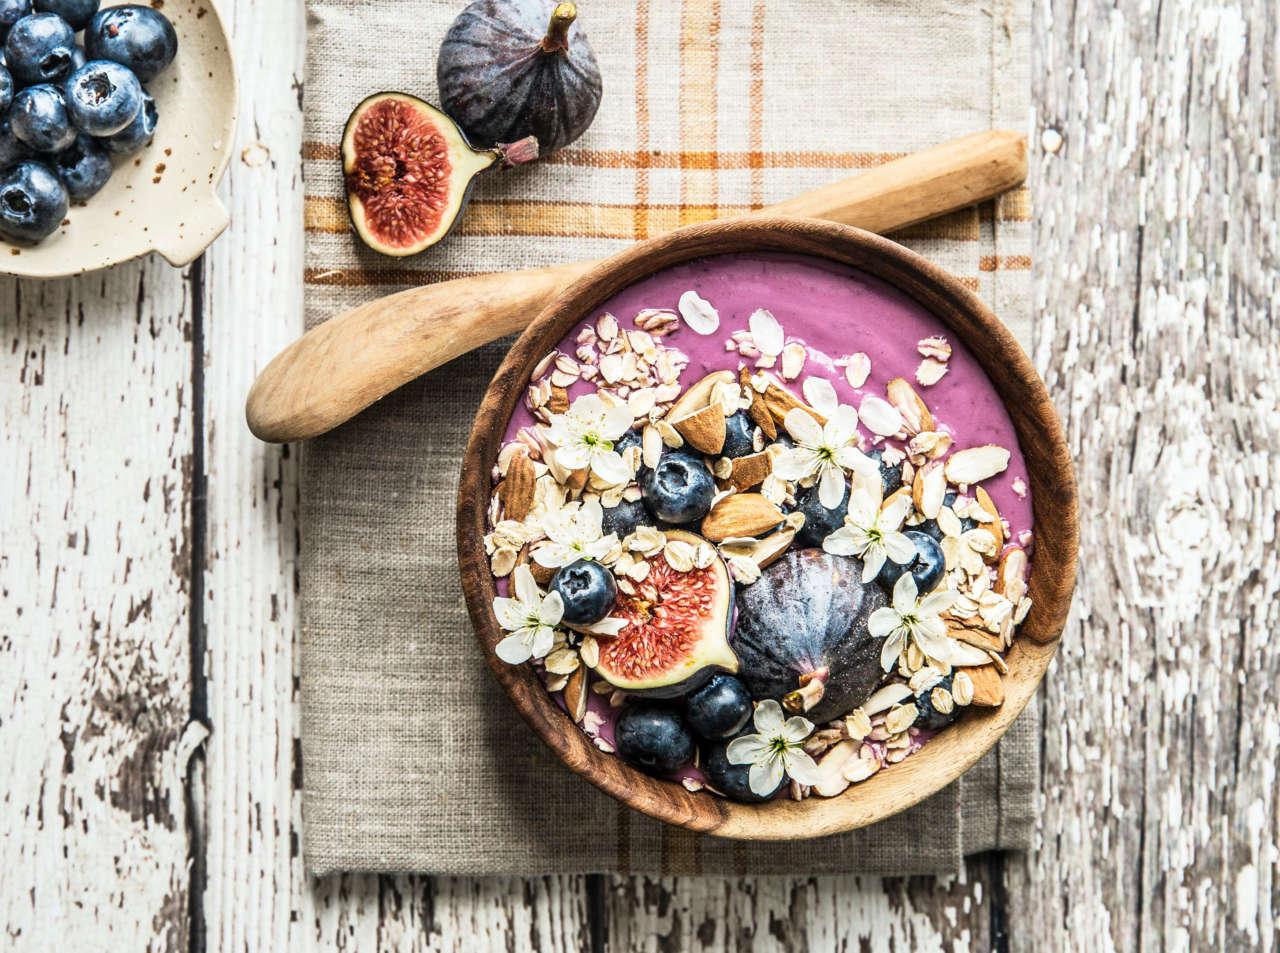 smoothie-bowl-viola-allo-yogurt-greco-con-mirtilli,-fichi-e-mandorle